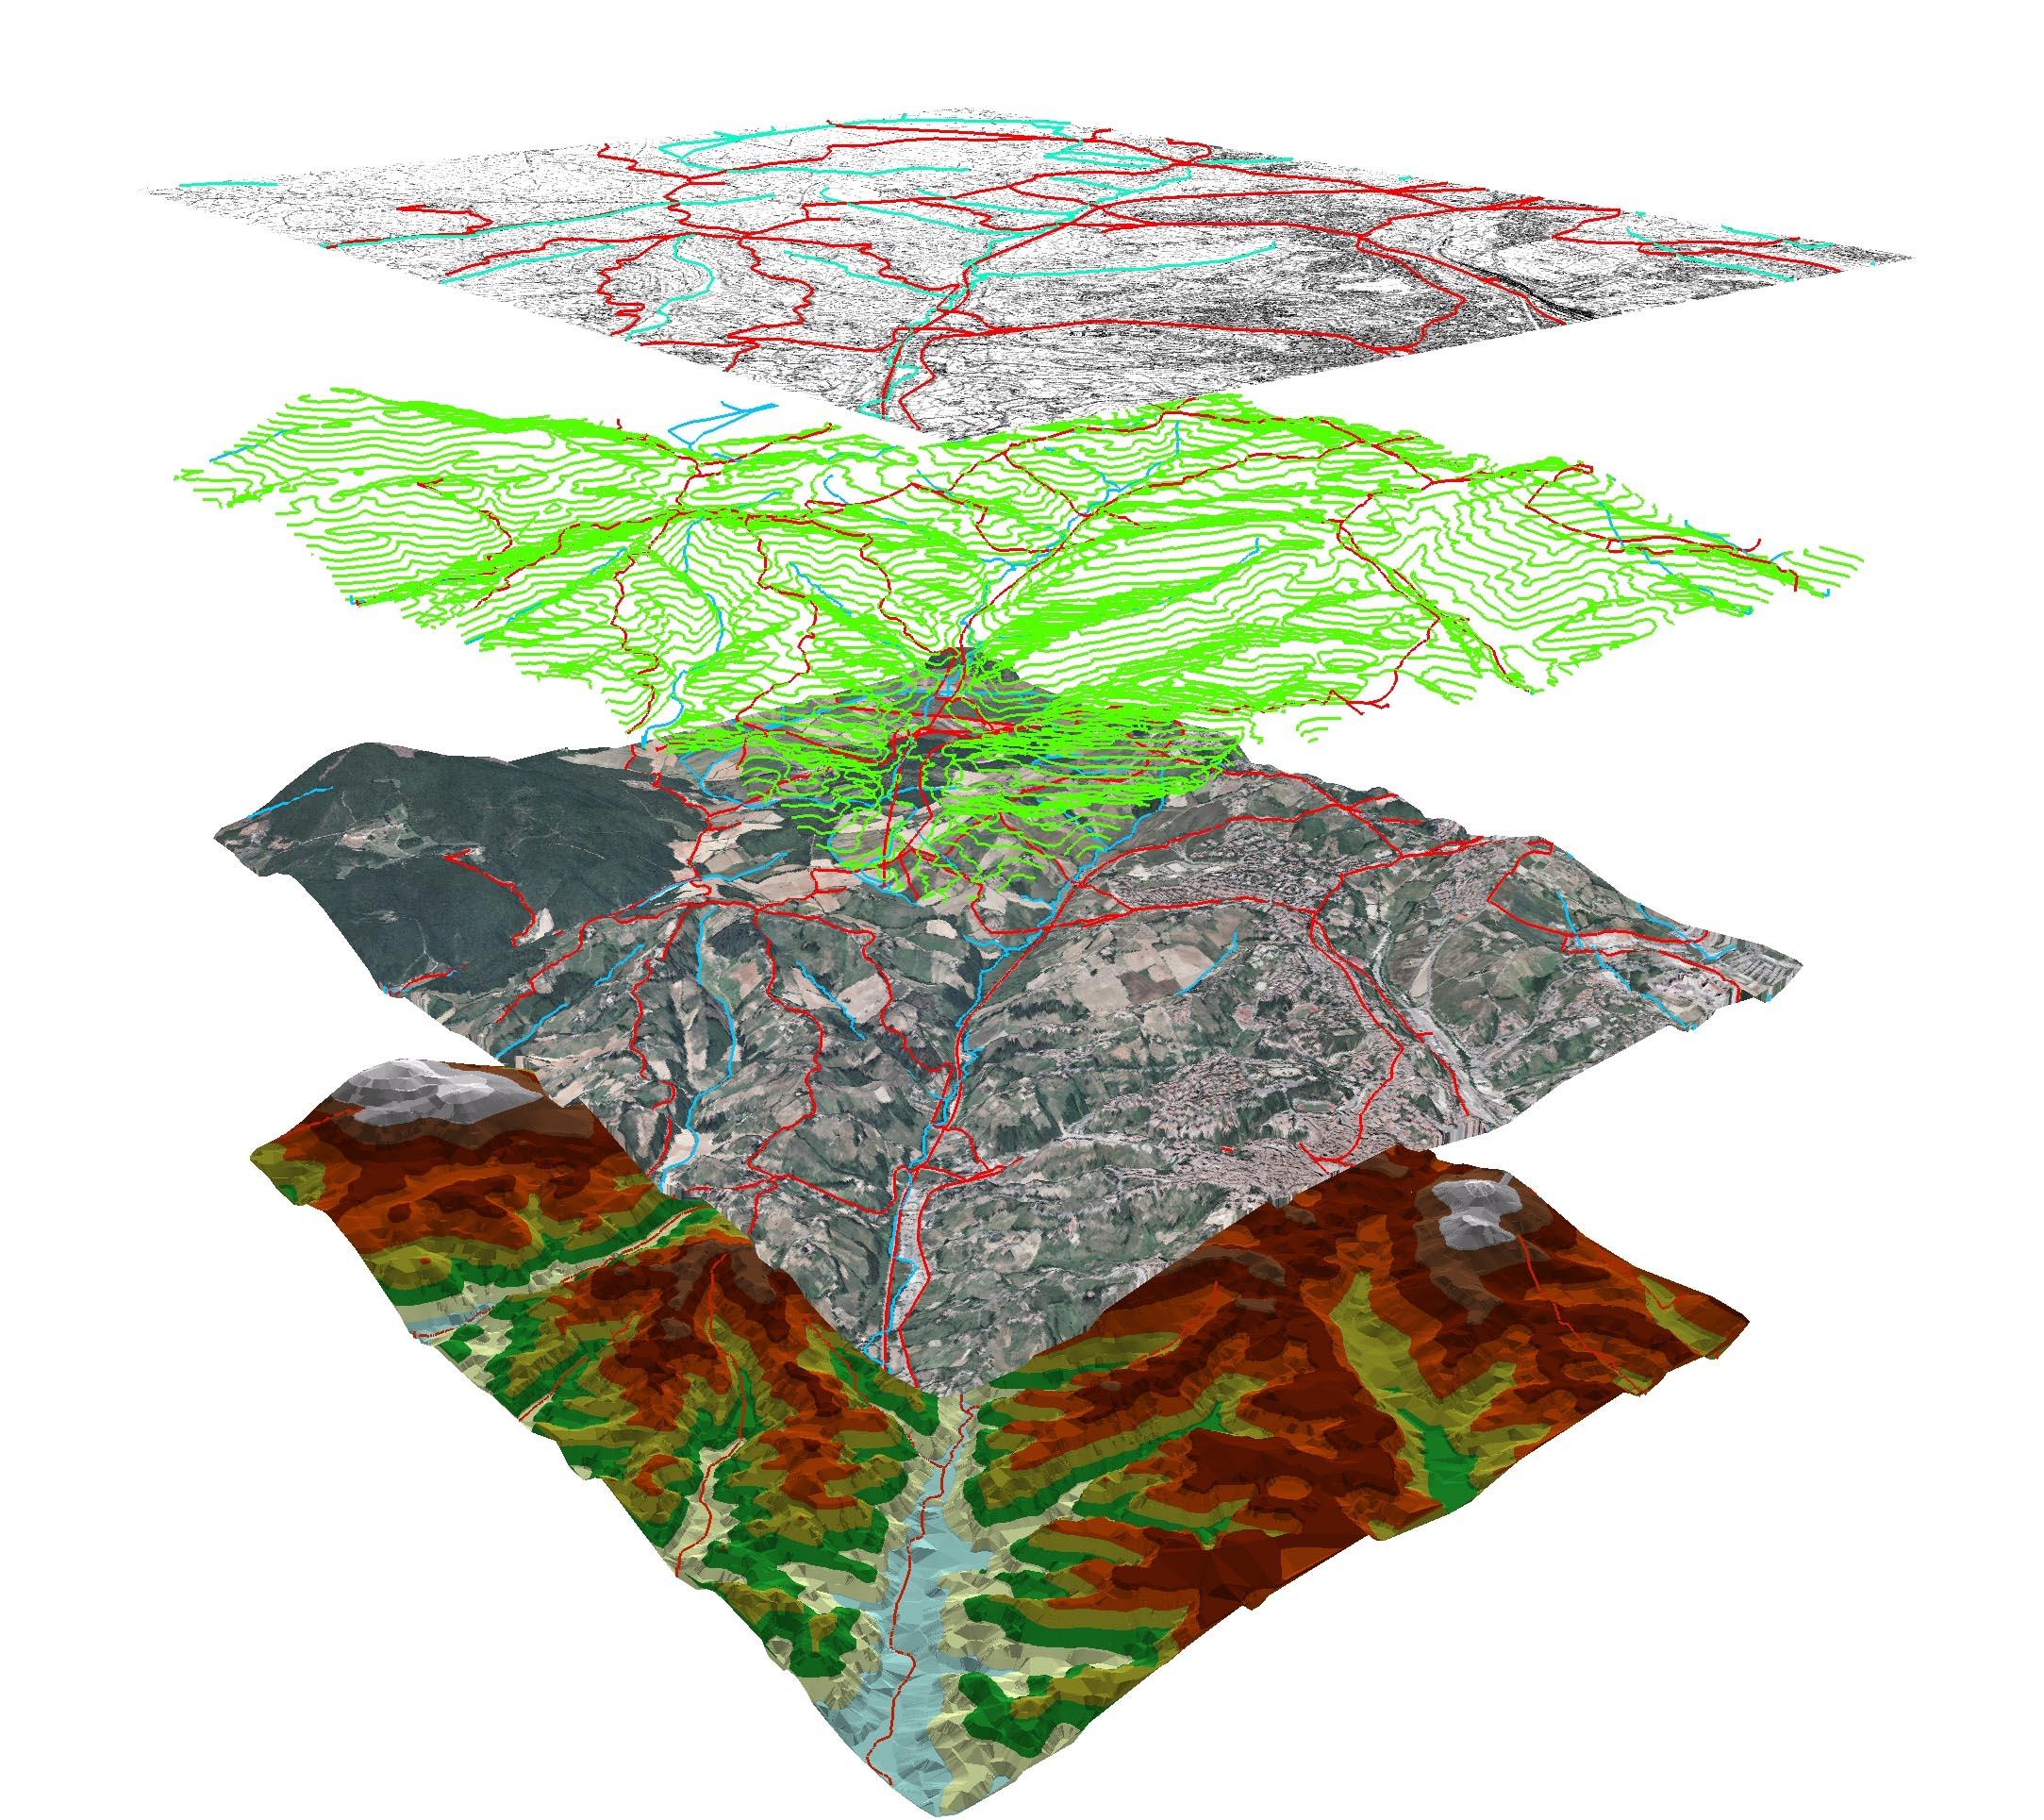 8_cartografia